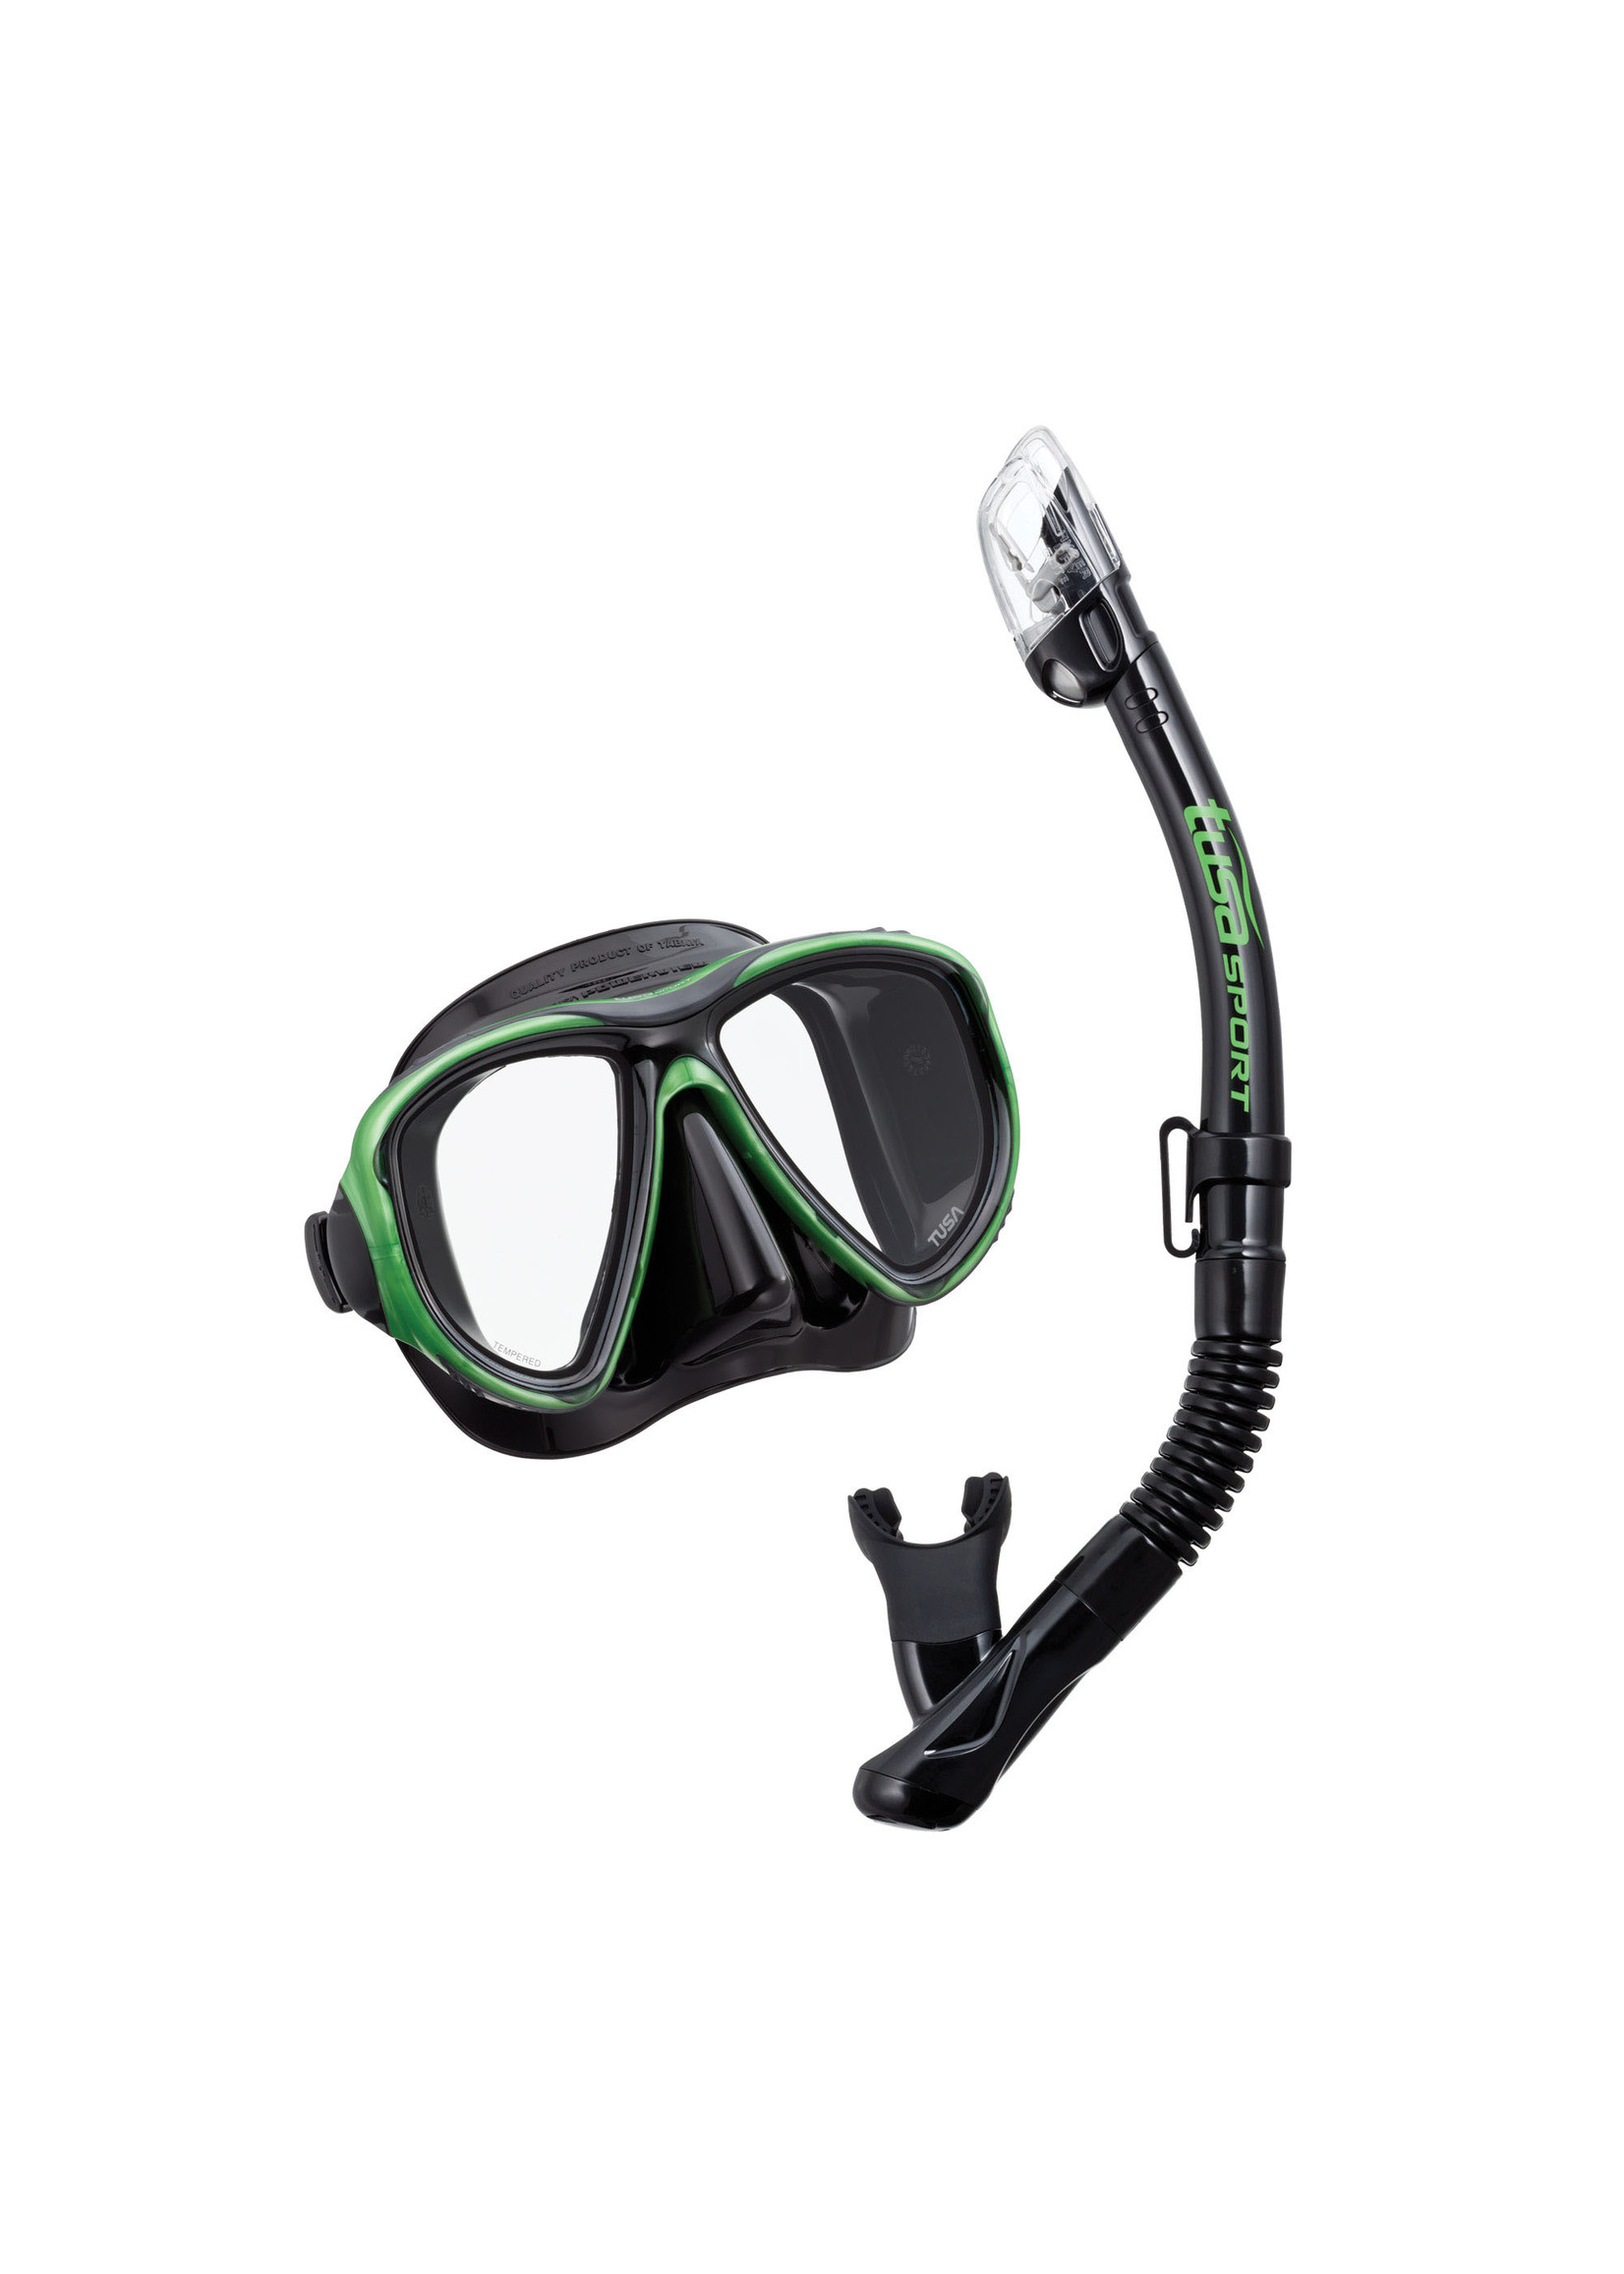 TUSA TUSA Powerview Adult Dry Combo - Black/Siesta Green